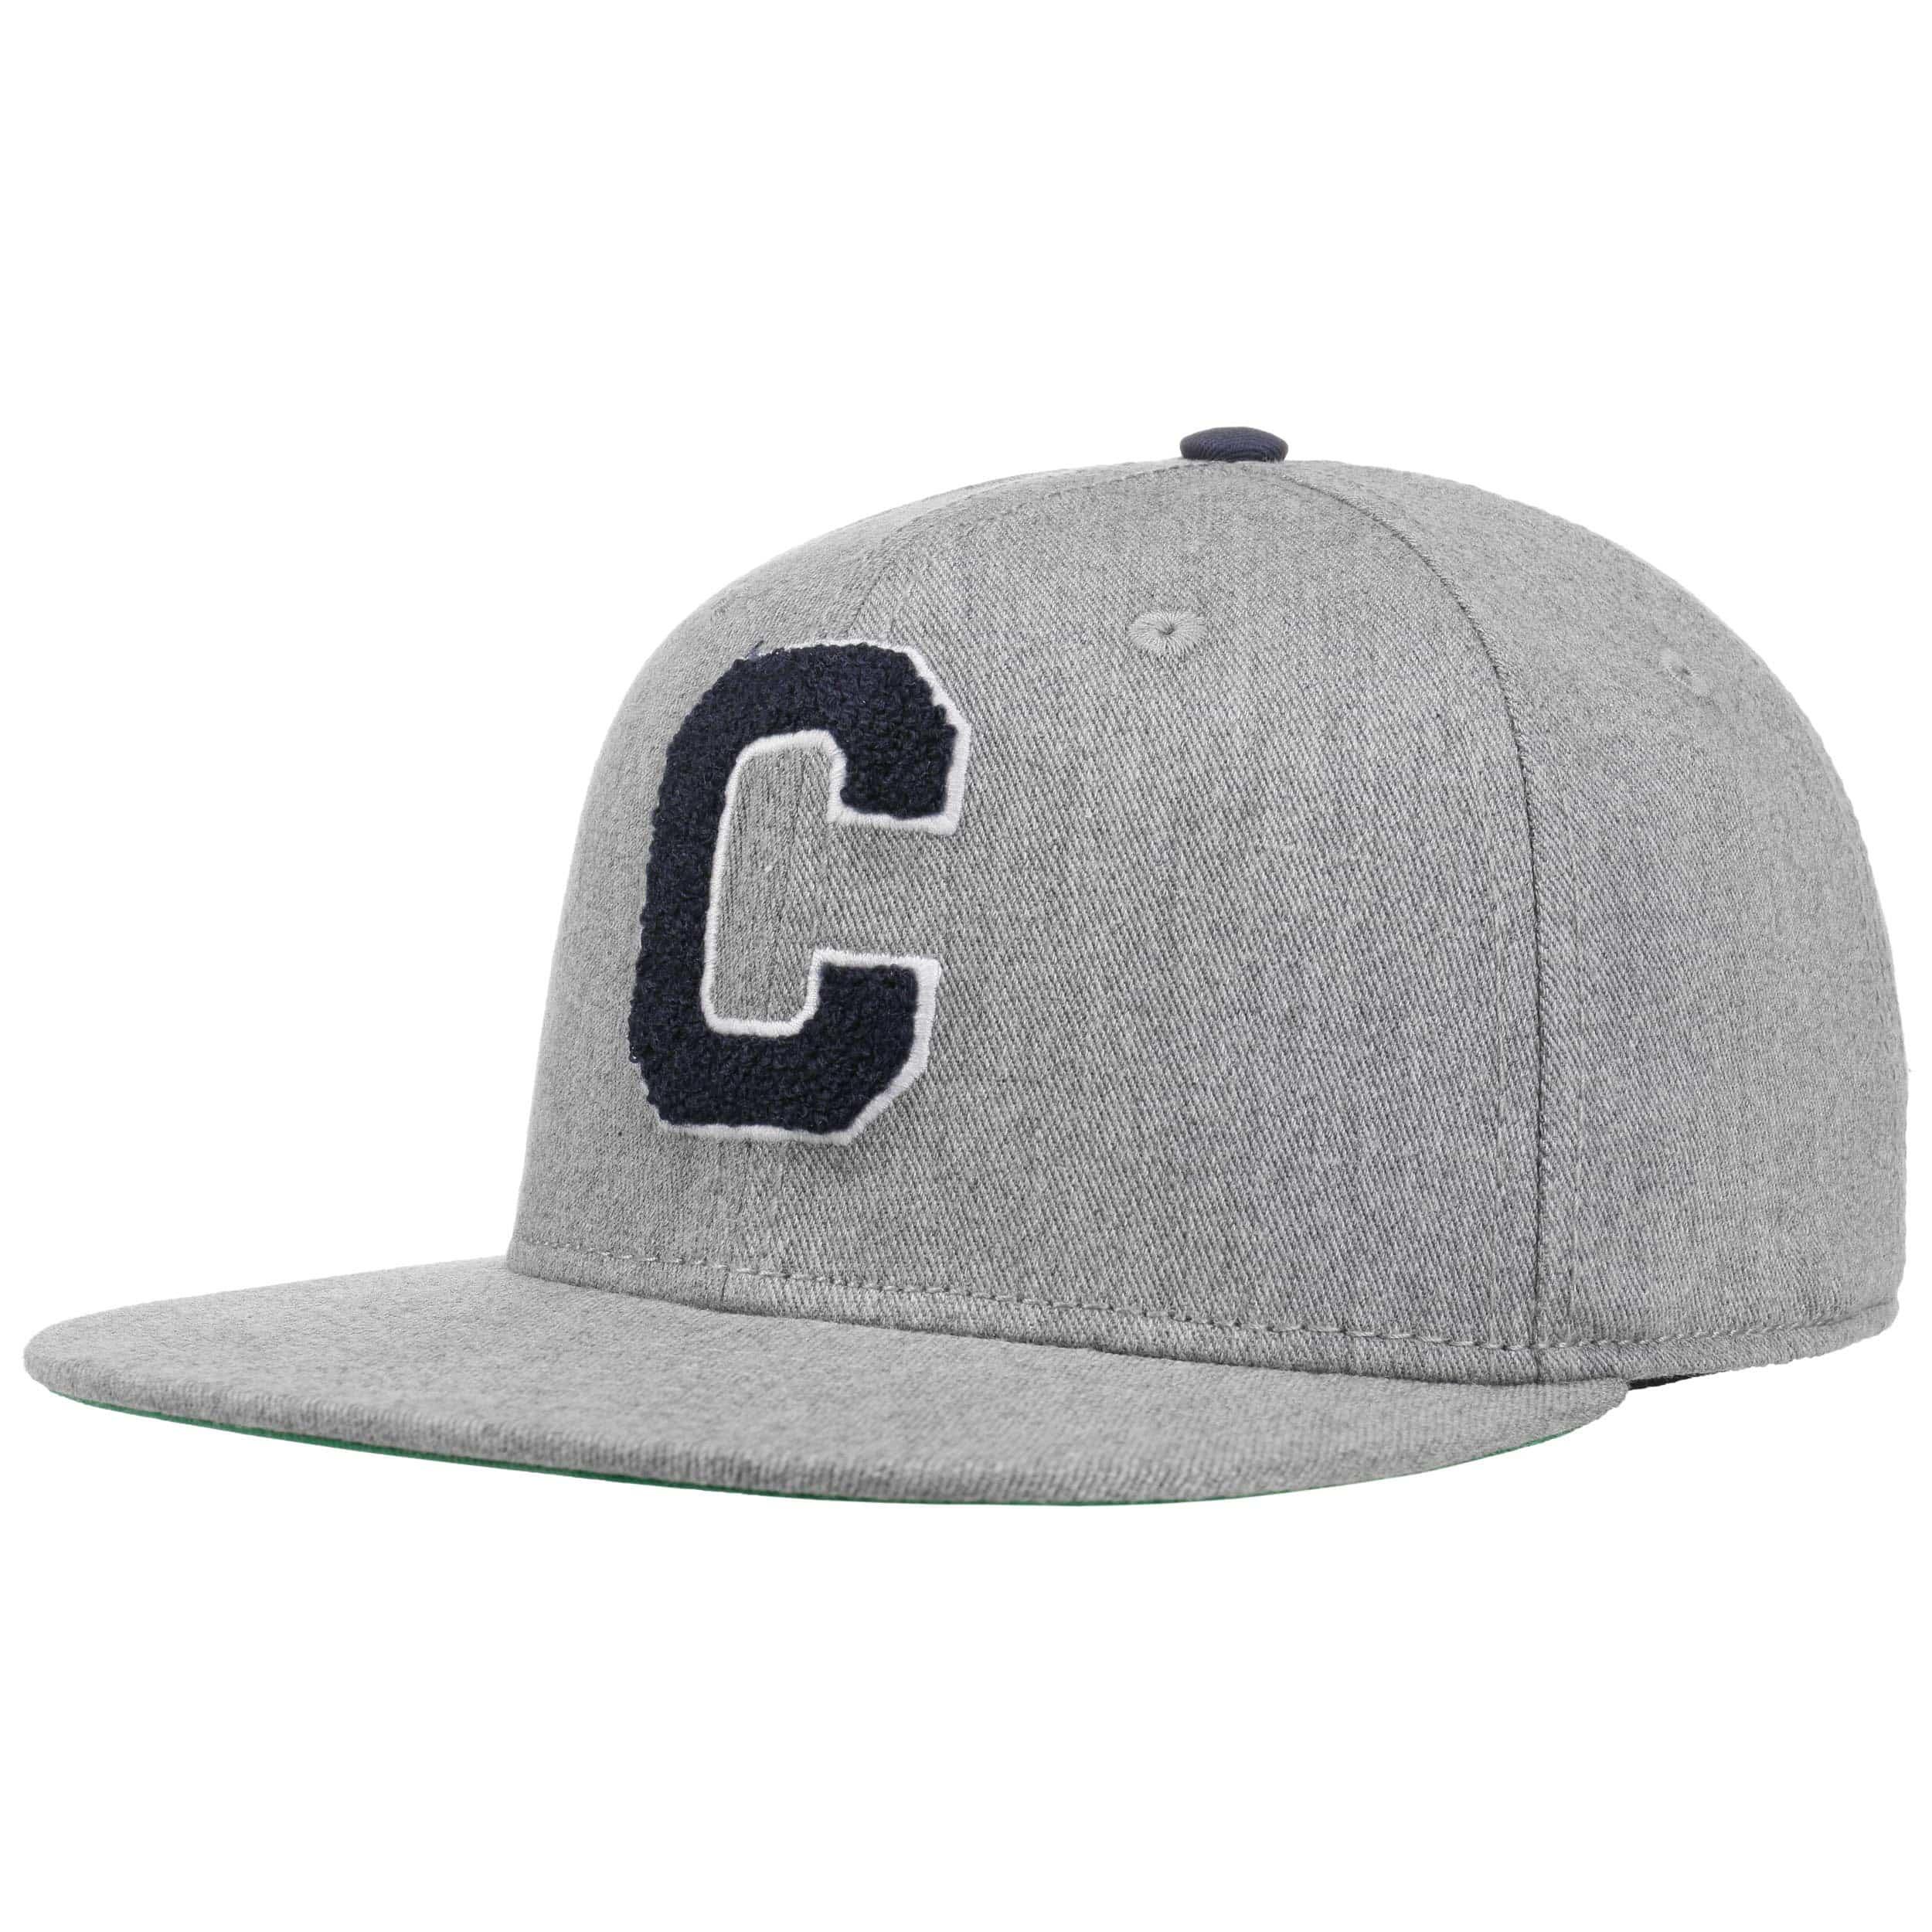 ... Chenille C Snapback Cap by Converse - black 5 44458b92f56f